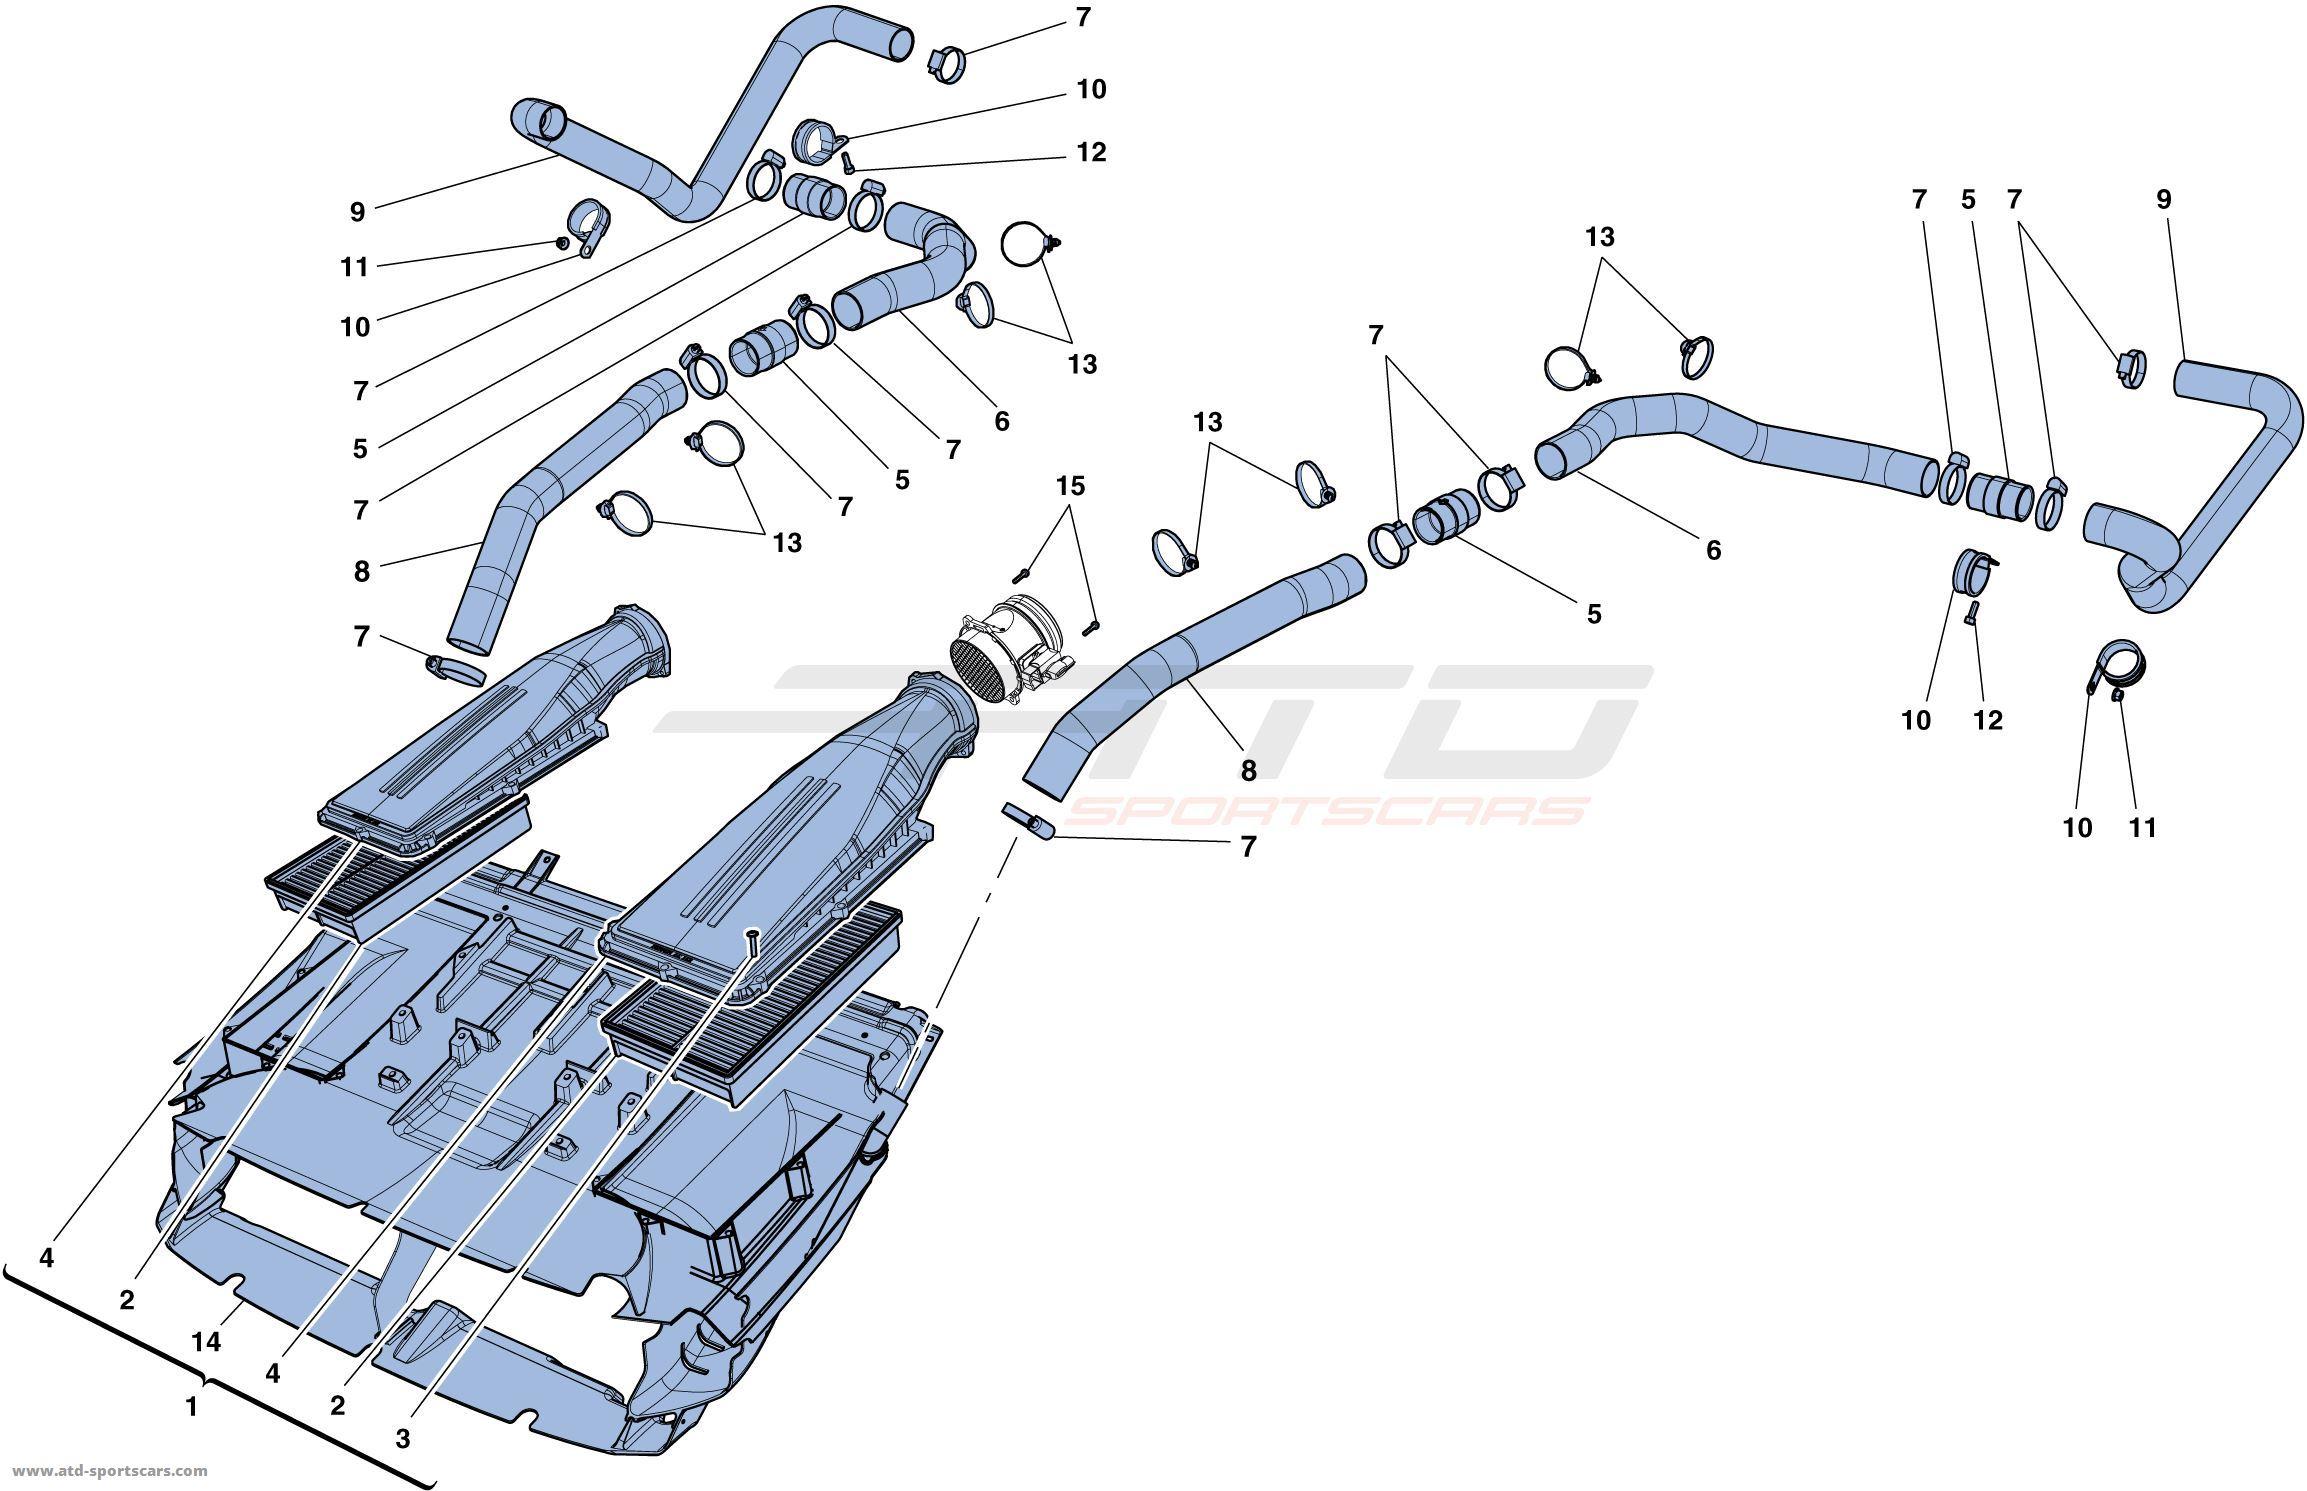 INTAKE MANIFOLD - 0013 · F12 Berlinetta AIR INTAKE - 0014